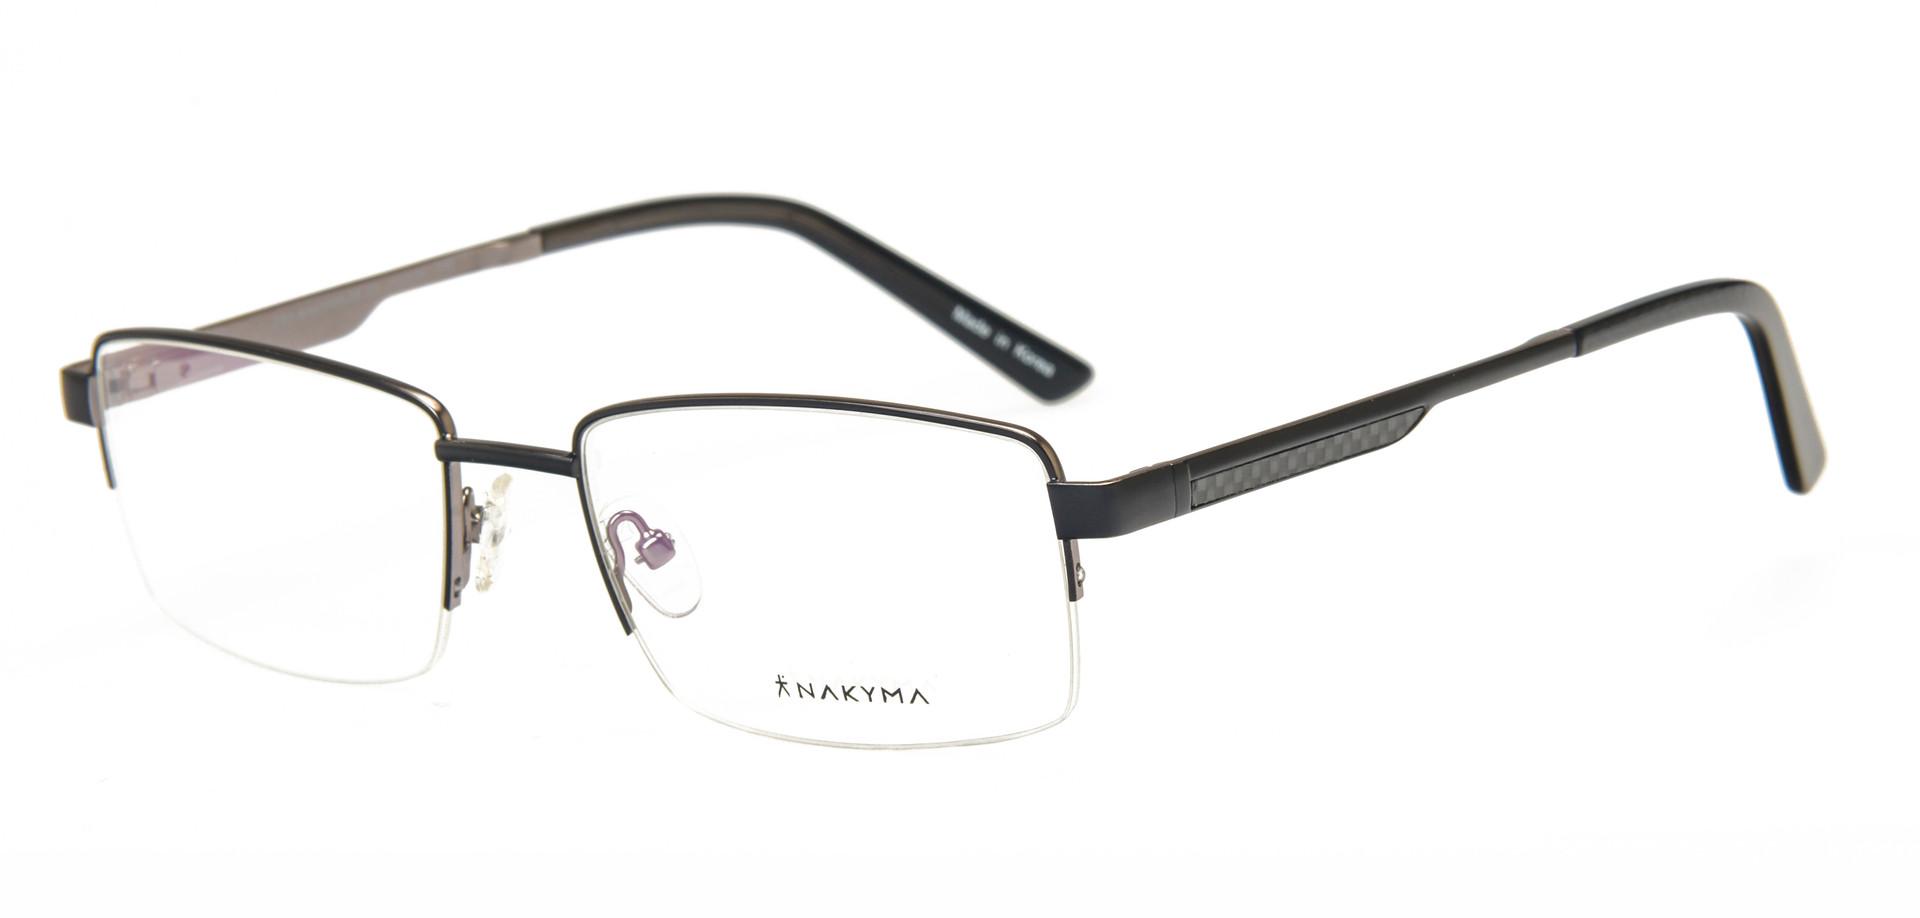 7R1-NAKYMA-08-C2